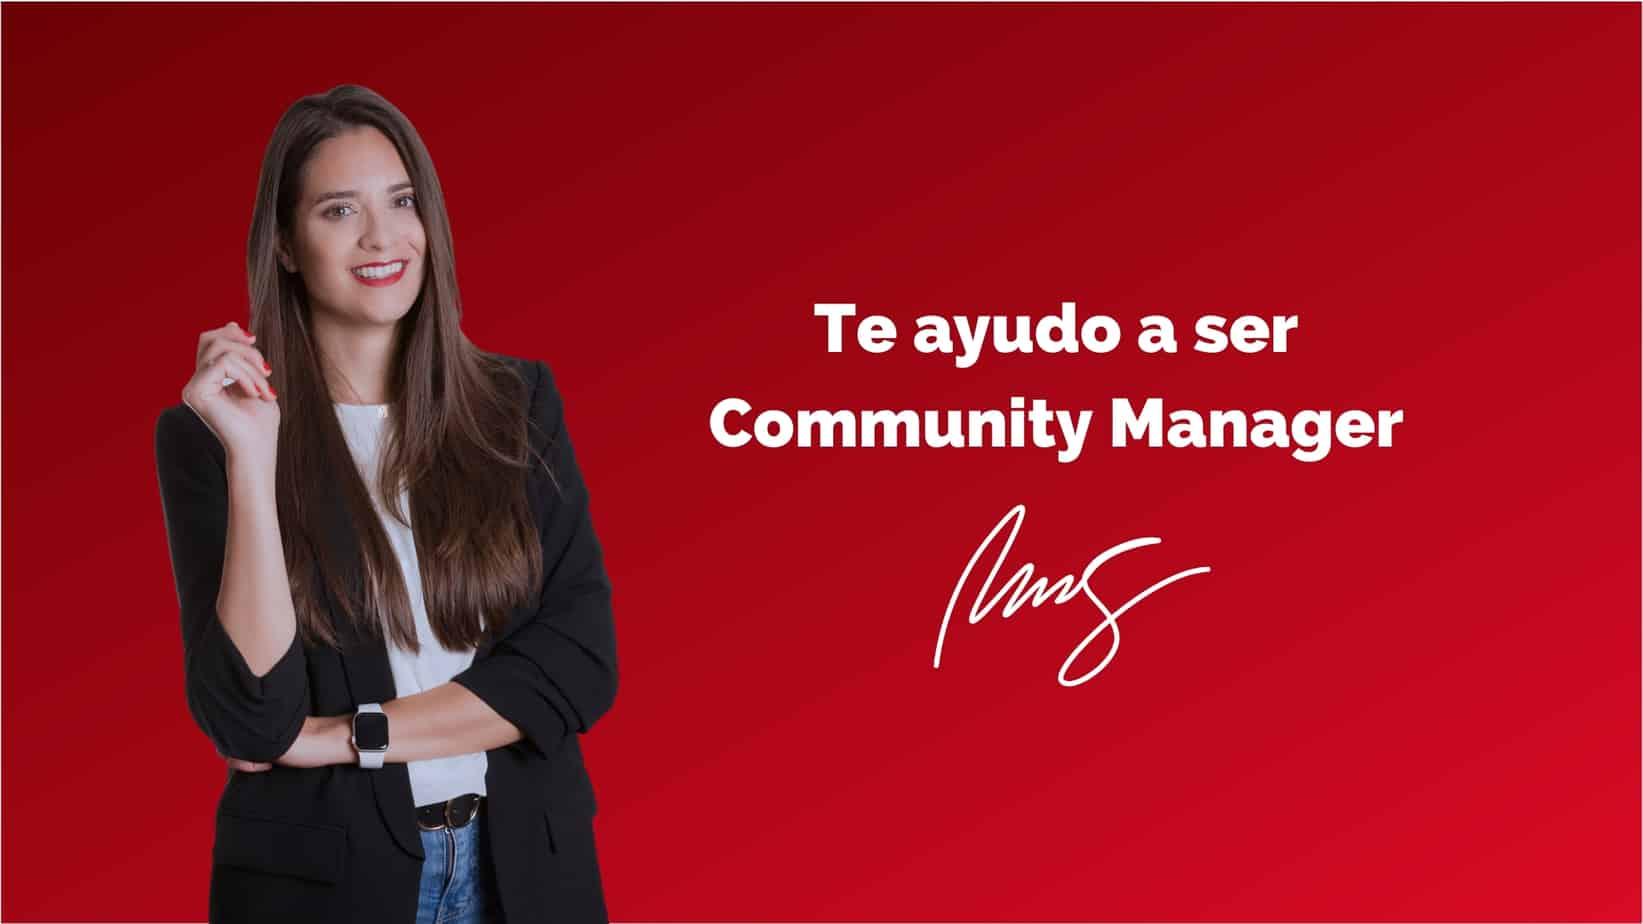 Community Manager desde cero